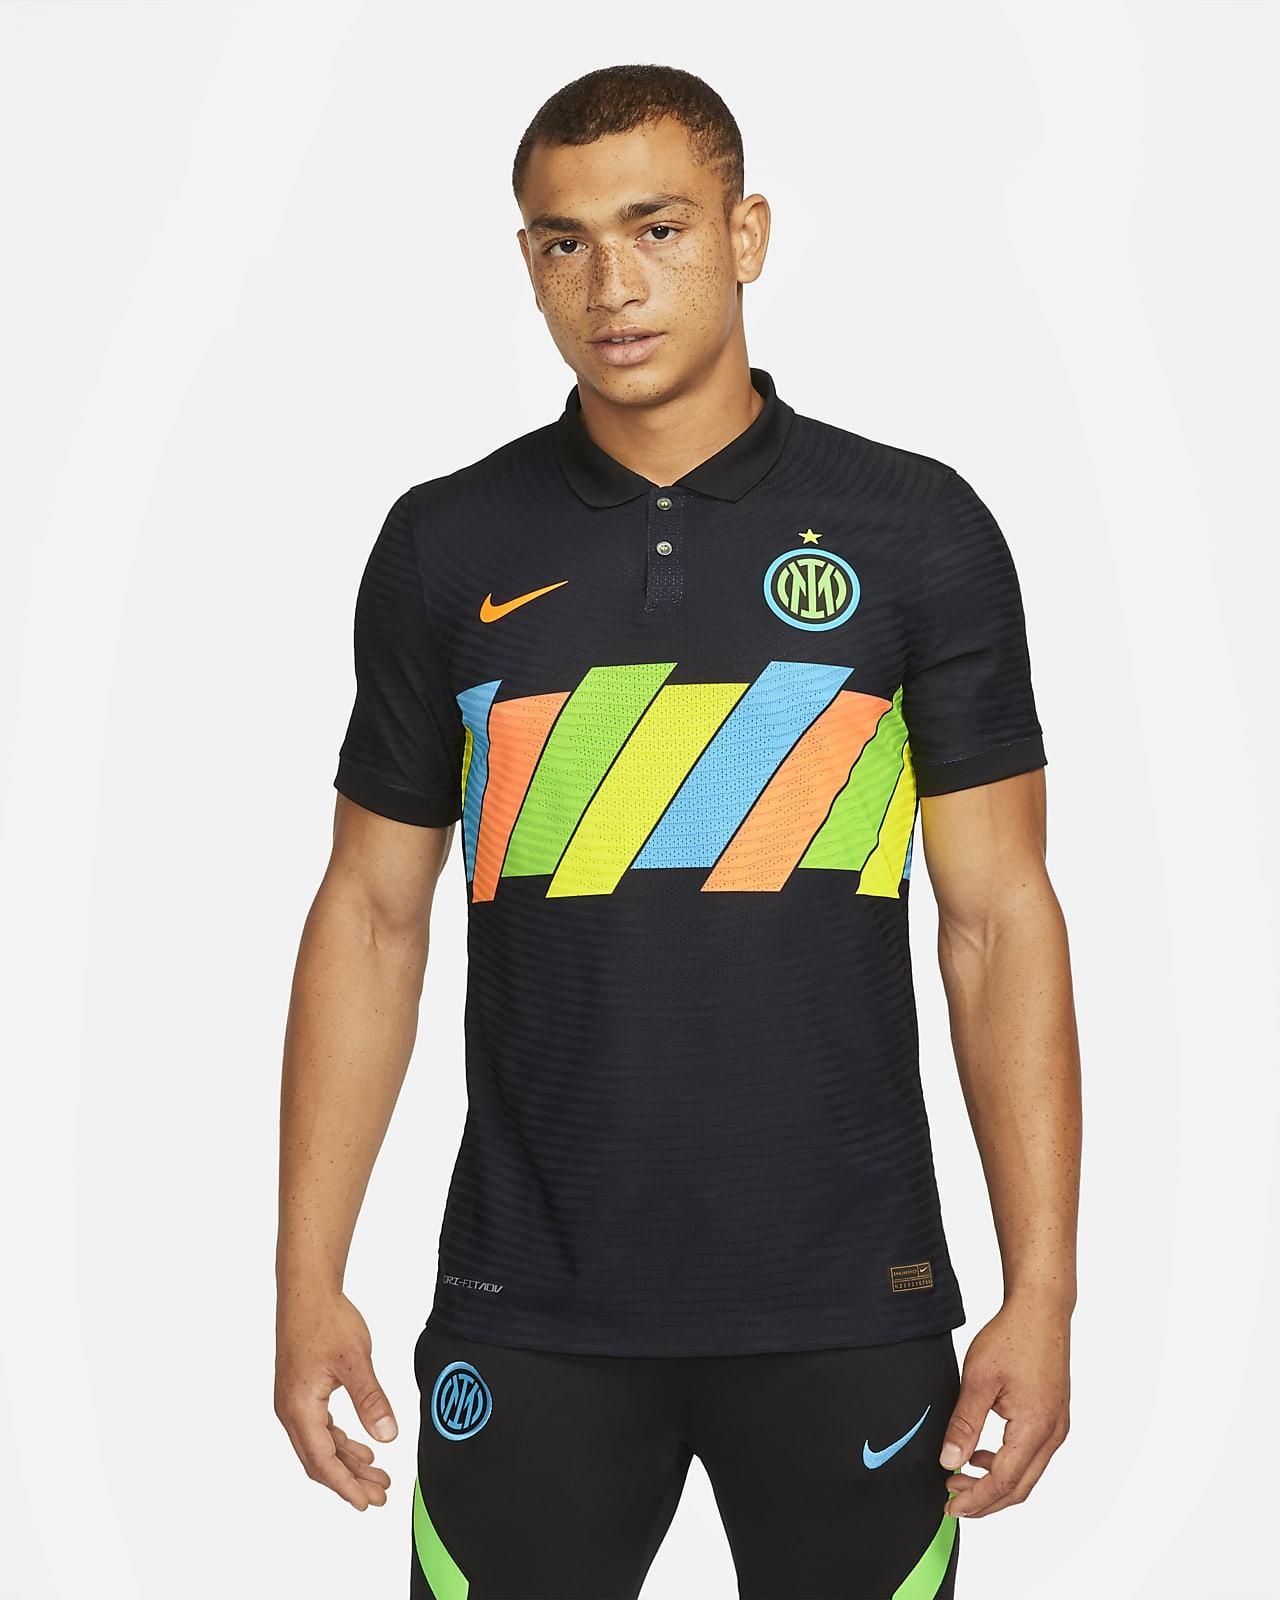 Maillot de football Nike Dri-FIT ADV Inter Milan 2021/22 Match pour Homme